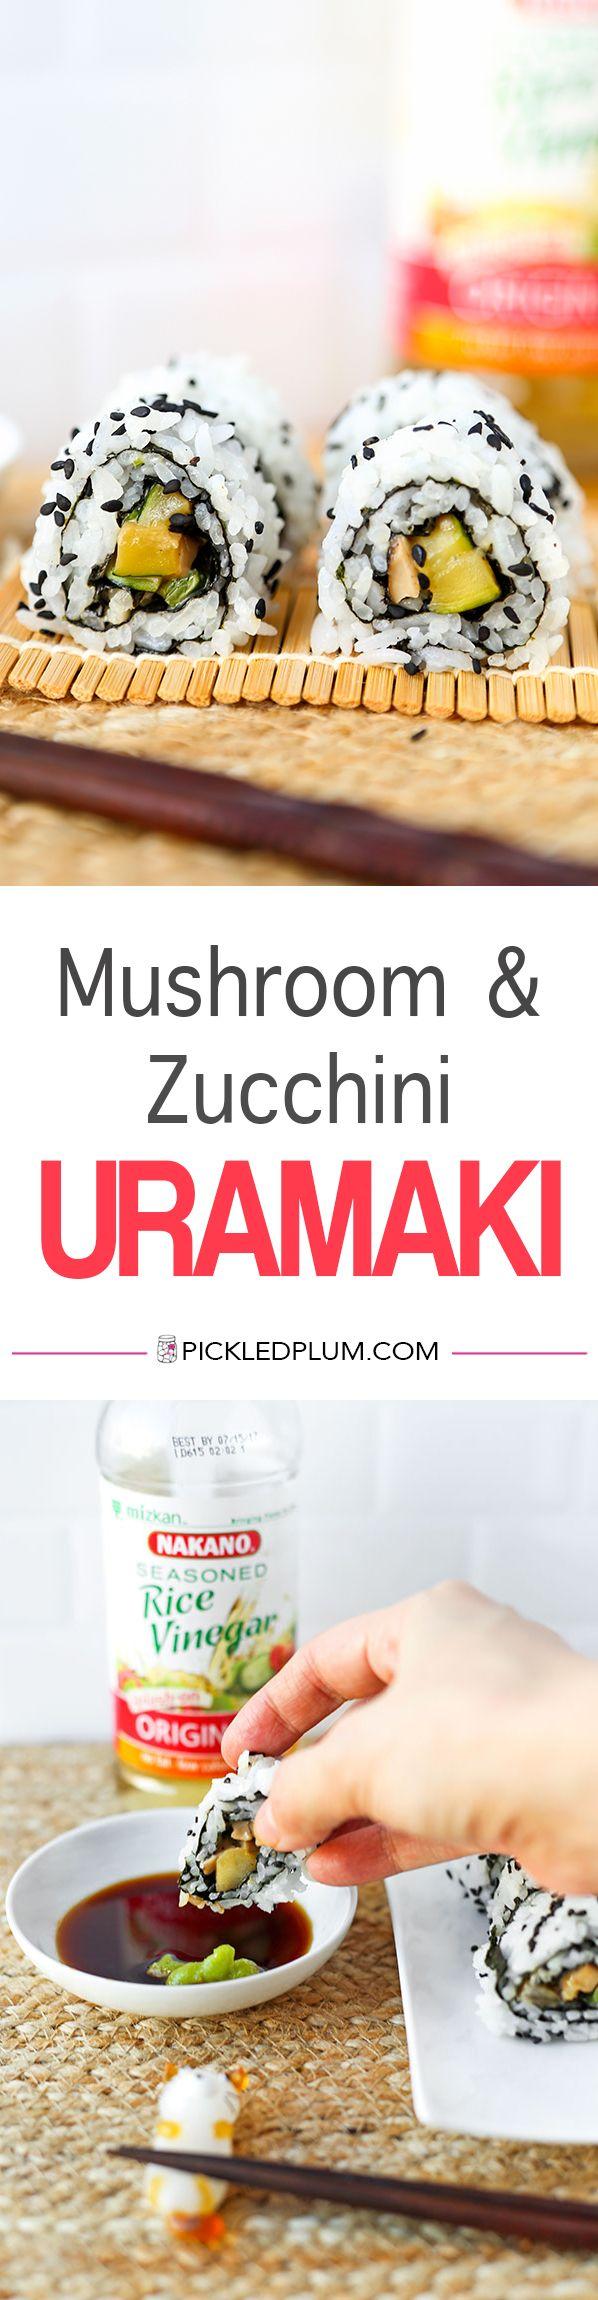 Mushroom & Zucchini Uramaki Rolls ( Inside Out Rolls) - recipe, Japanese food, sushi, onigiri, maki rolls, vegetables, #ad